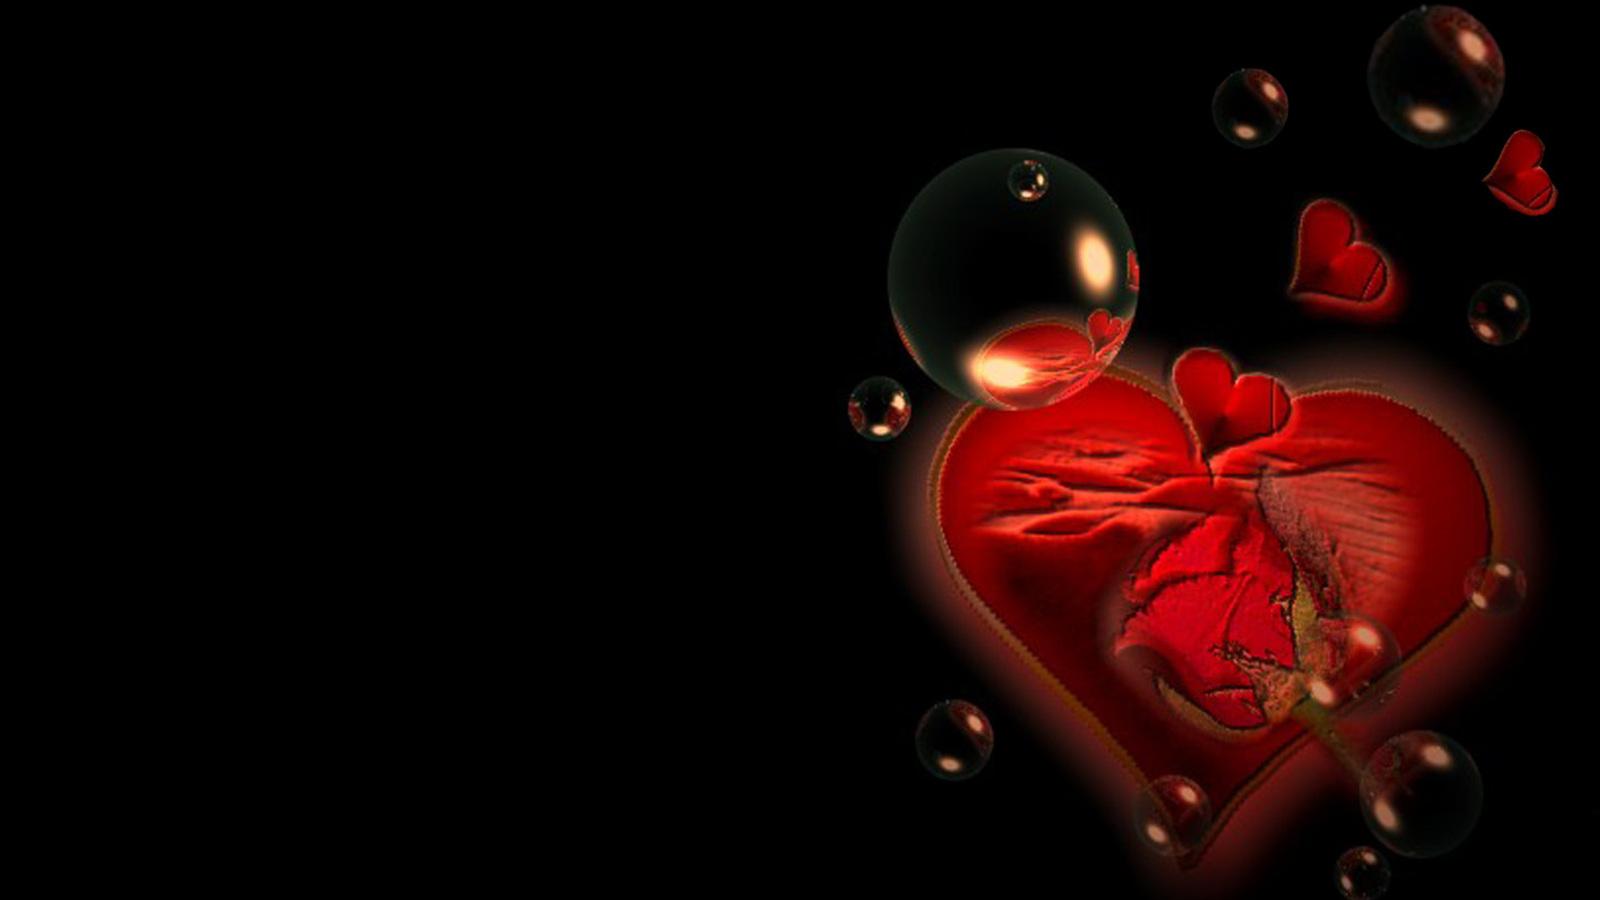 Love 3d Wallpaper Live HD Wallpaper HQ Pictures Images Photos 1600x900